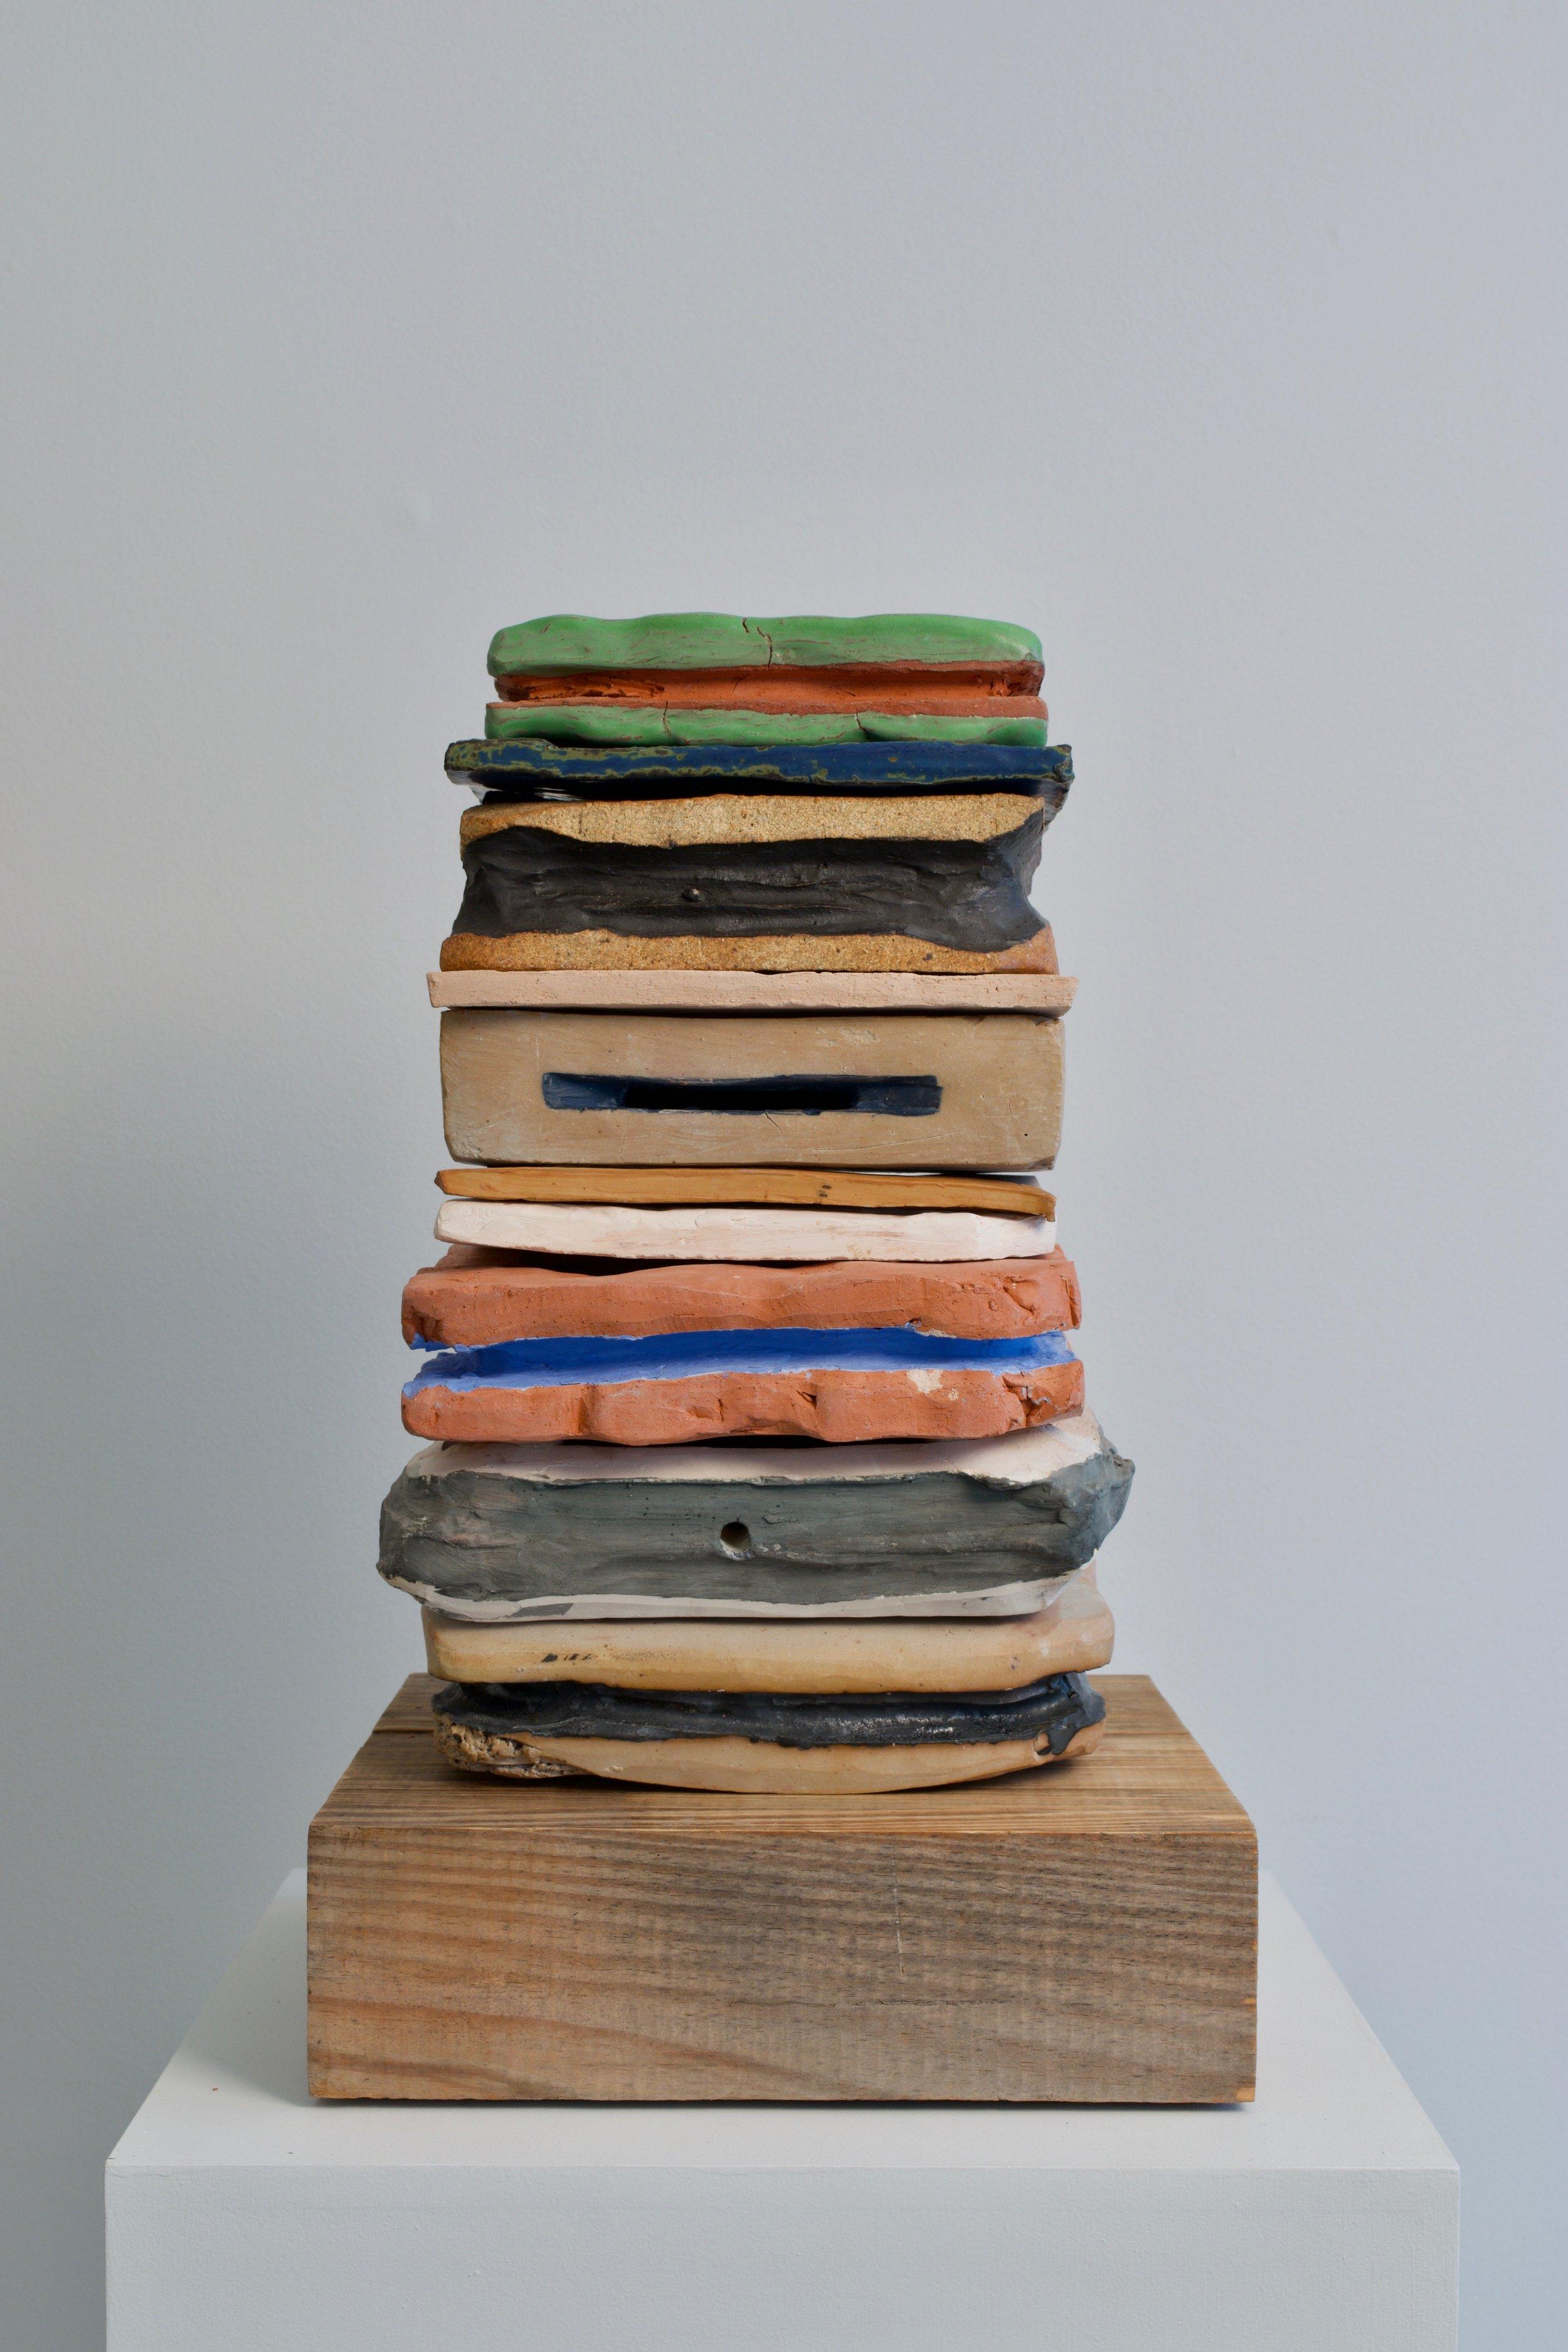 Katia Ramsey-Read, Hive, 2019. Stoneware, Terra Cotta on Wood, 19 ¼ x 11 ¾ 11 ¾ inches